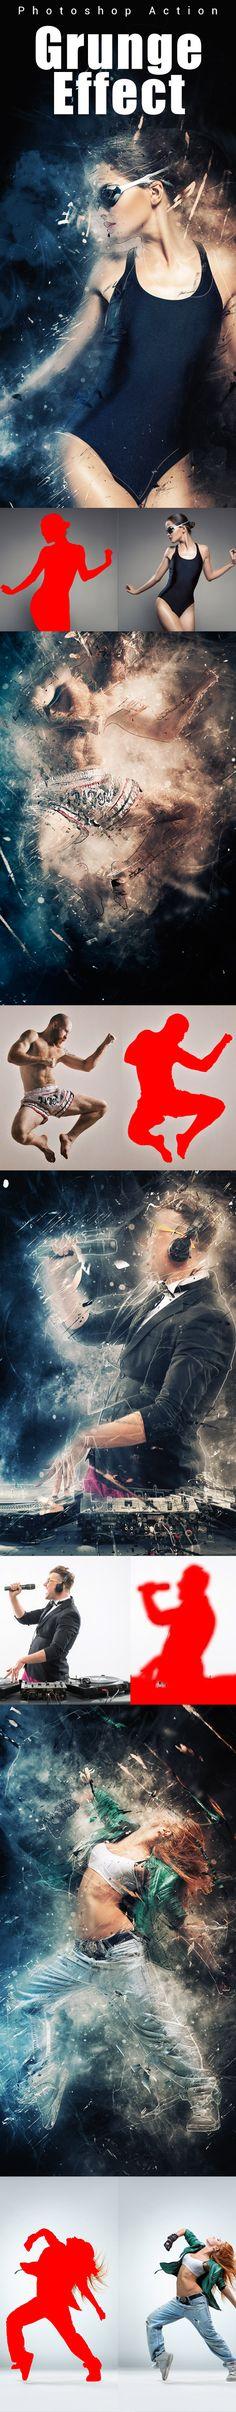 #Grunge Photoshop Action - #Actions #PSAction #Photoshop #PS #Graphicriver #PhotoEffects #Design #DigitalArt